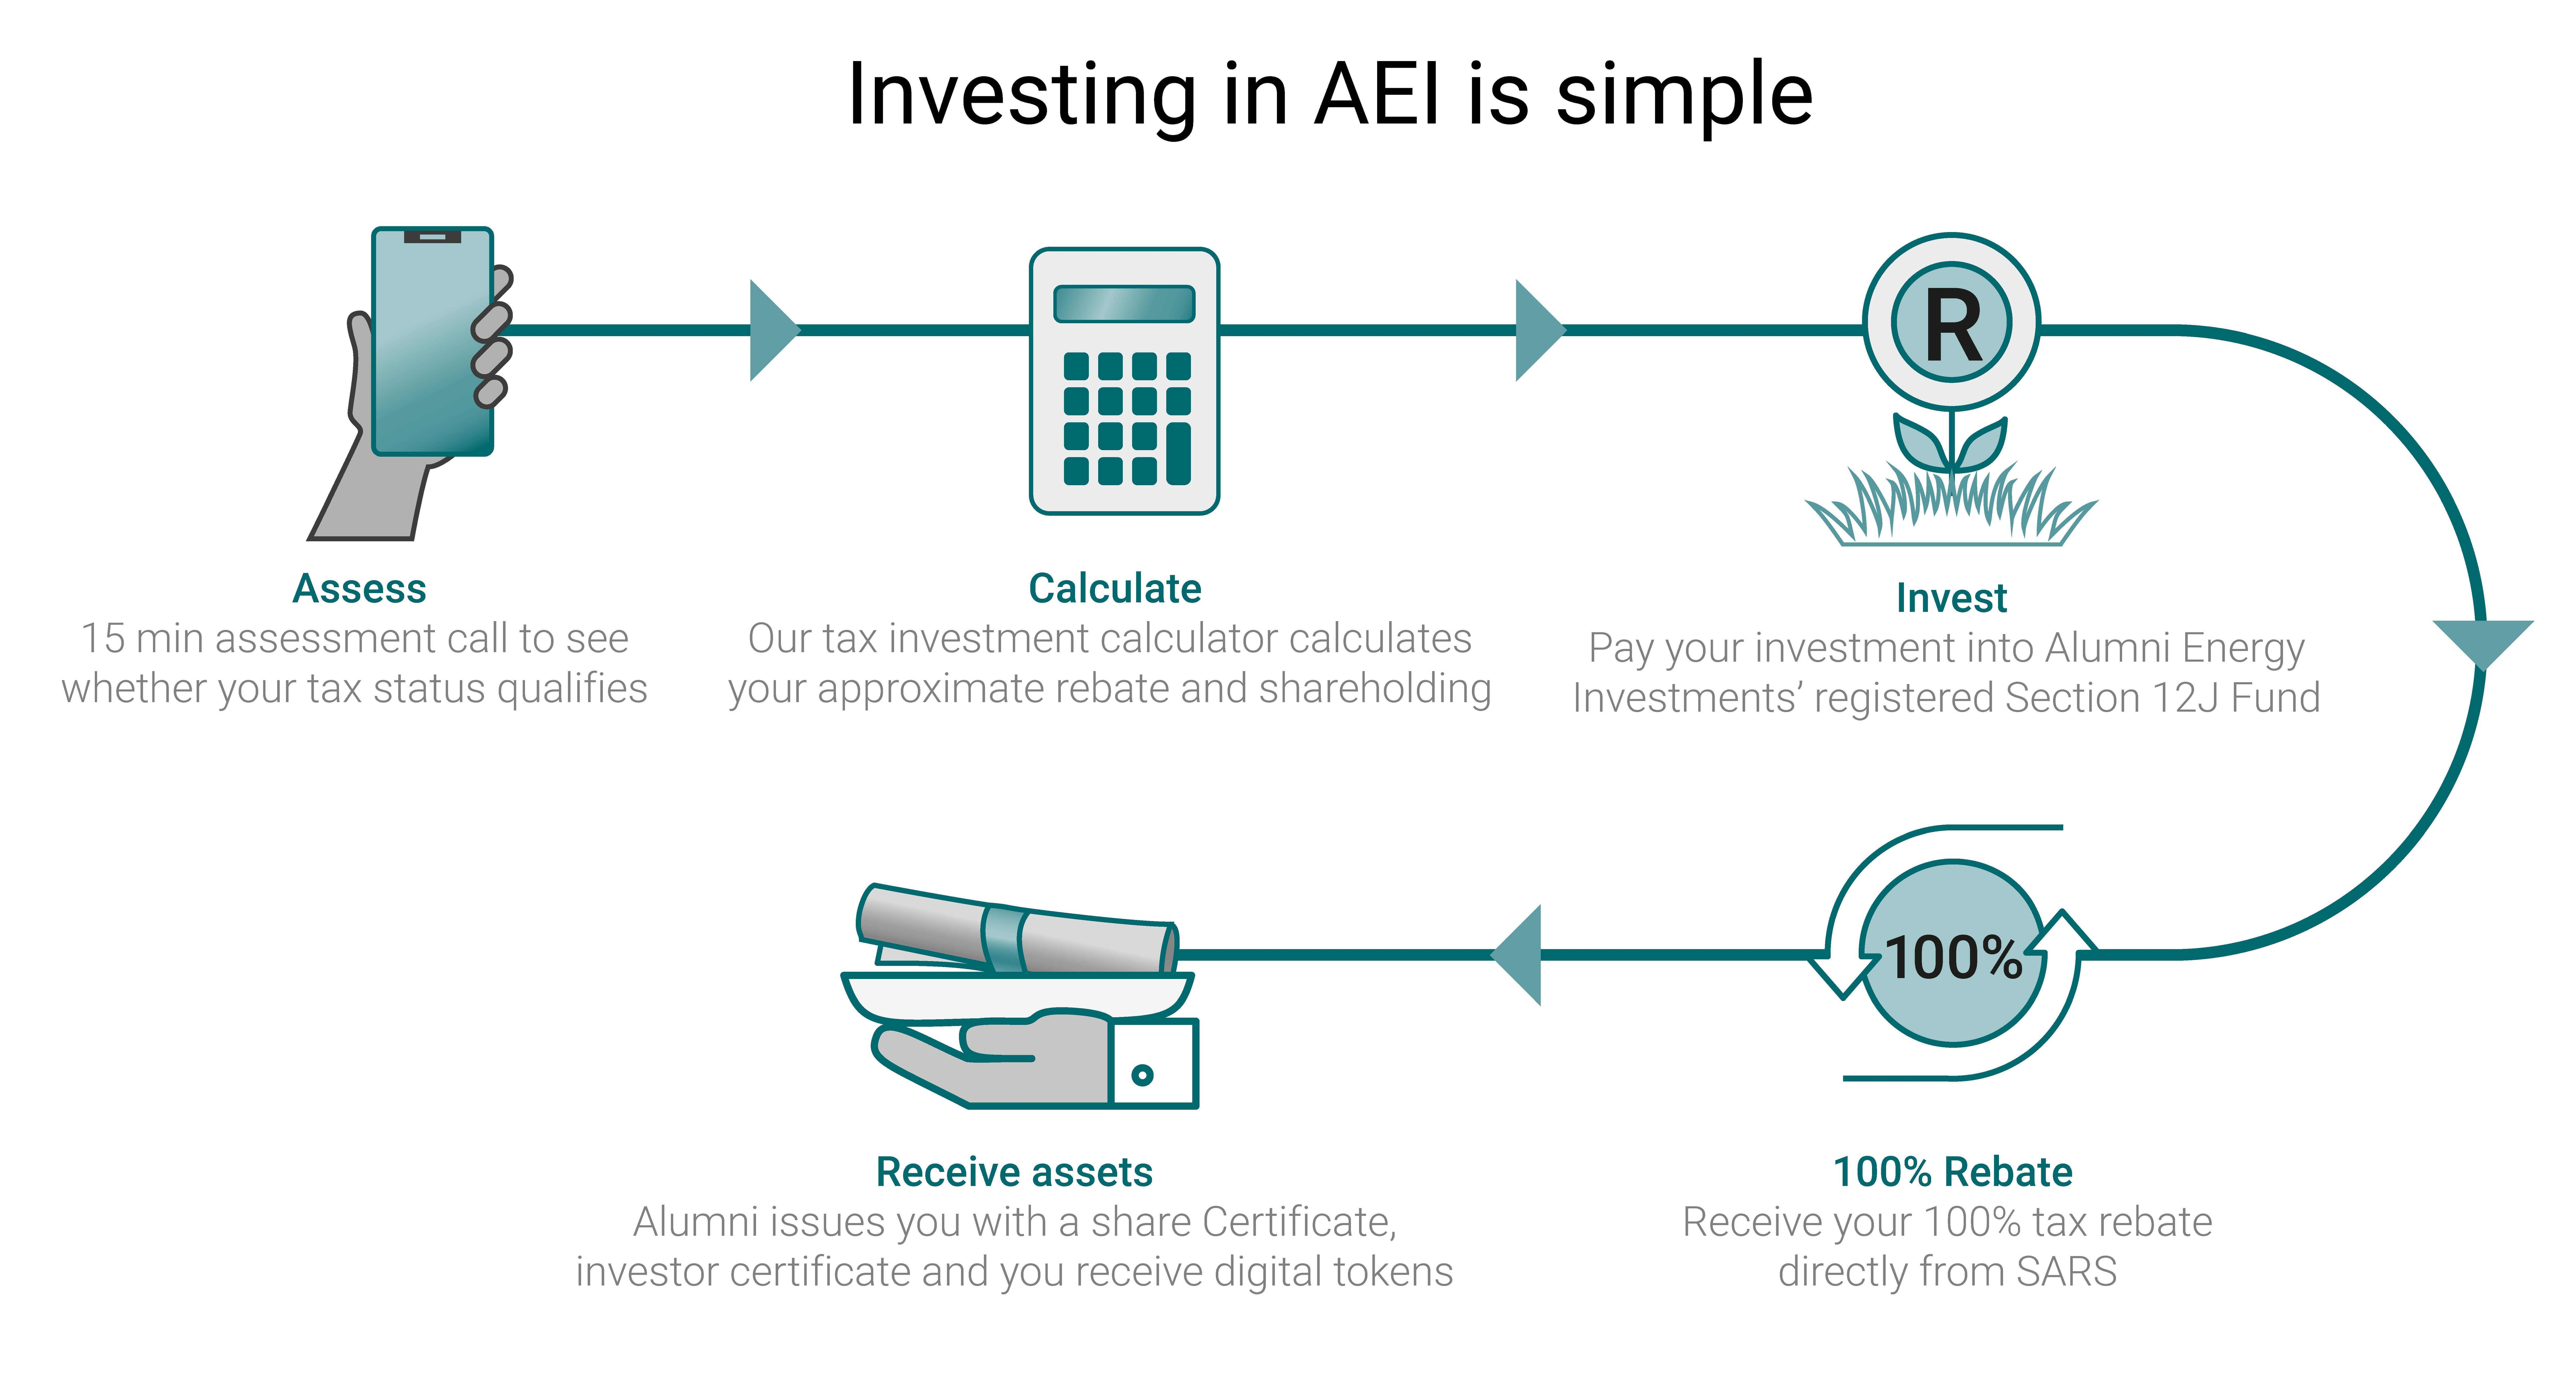 Investing in AEI is easy - flowchart